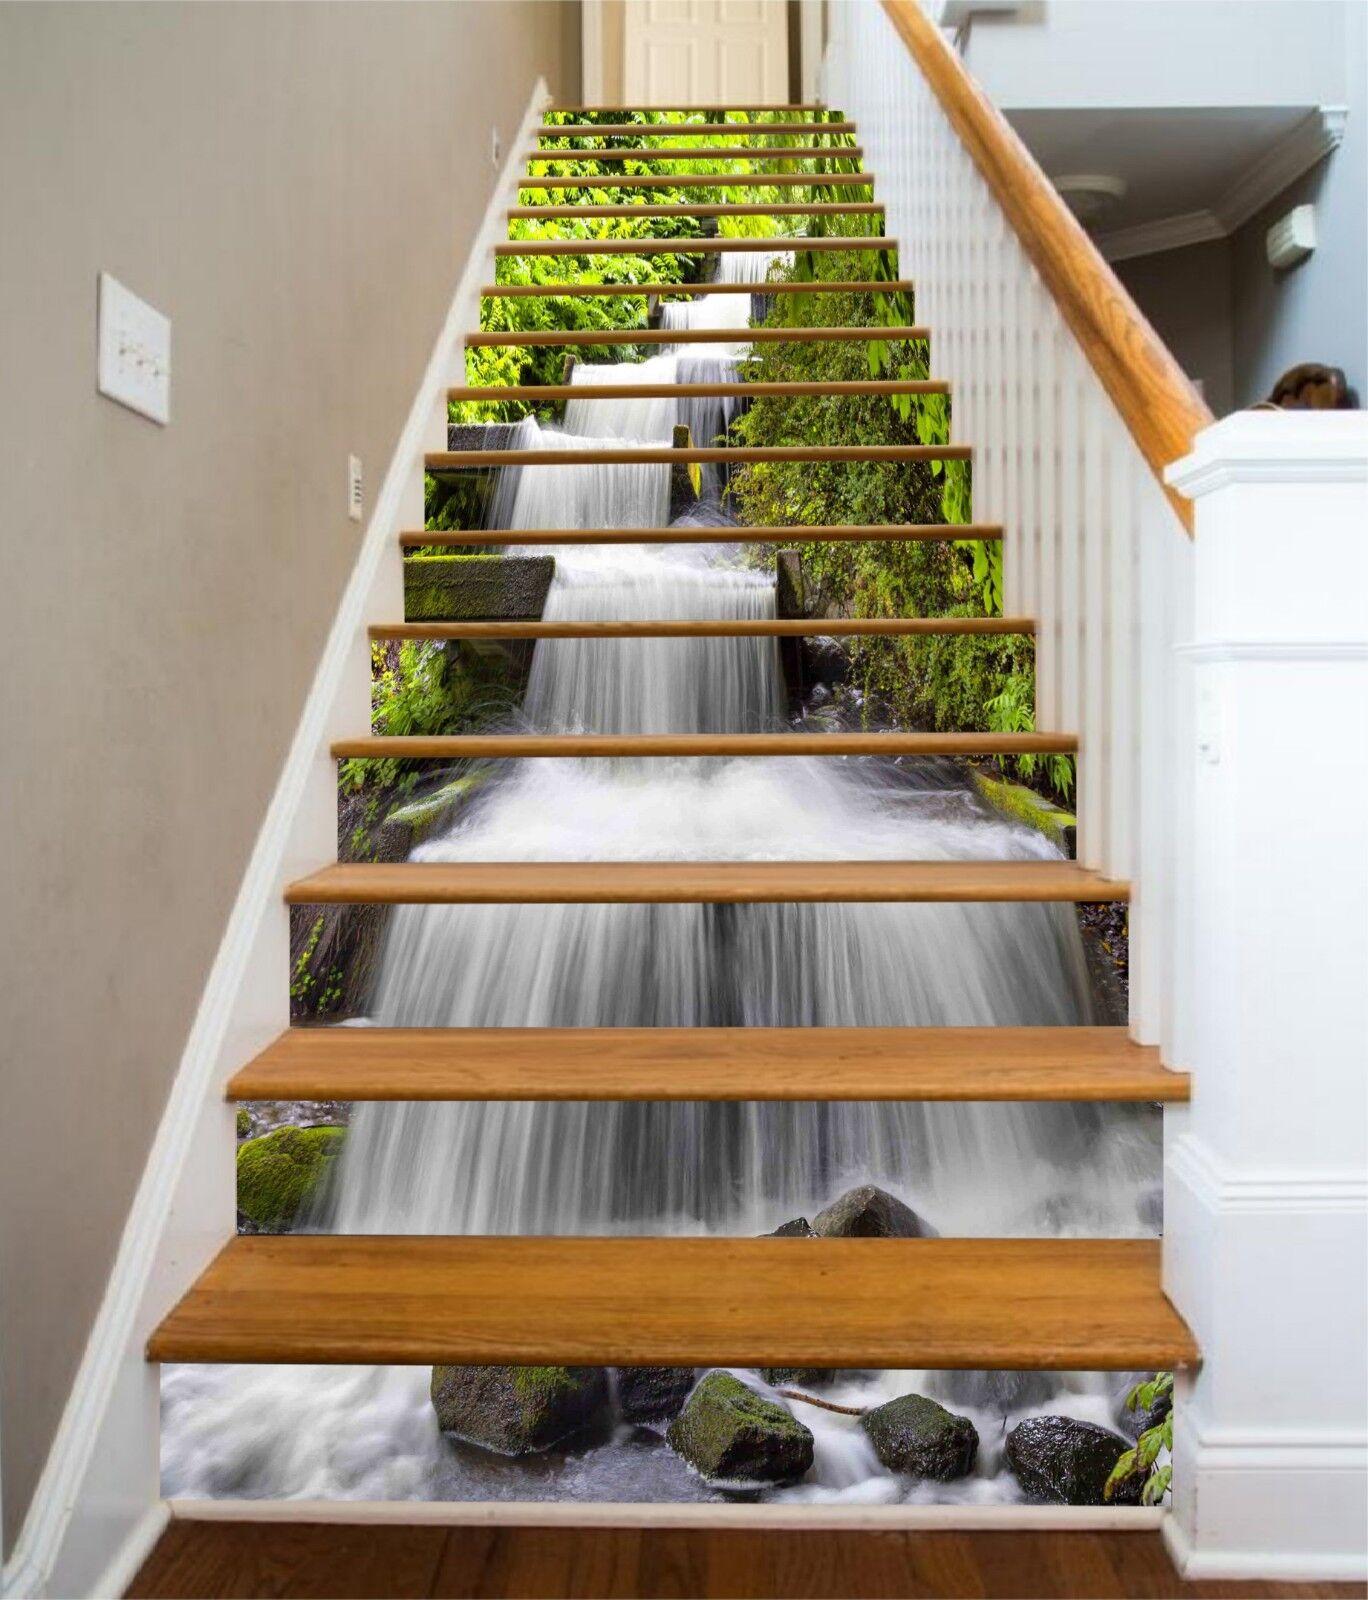 3D Trees Stream 06 Stair Risers Decoration Photo Mural Vinyl Decal Wallpaper CA